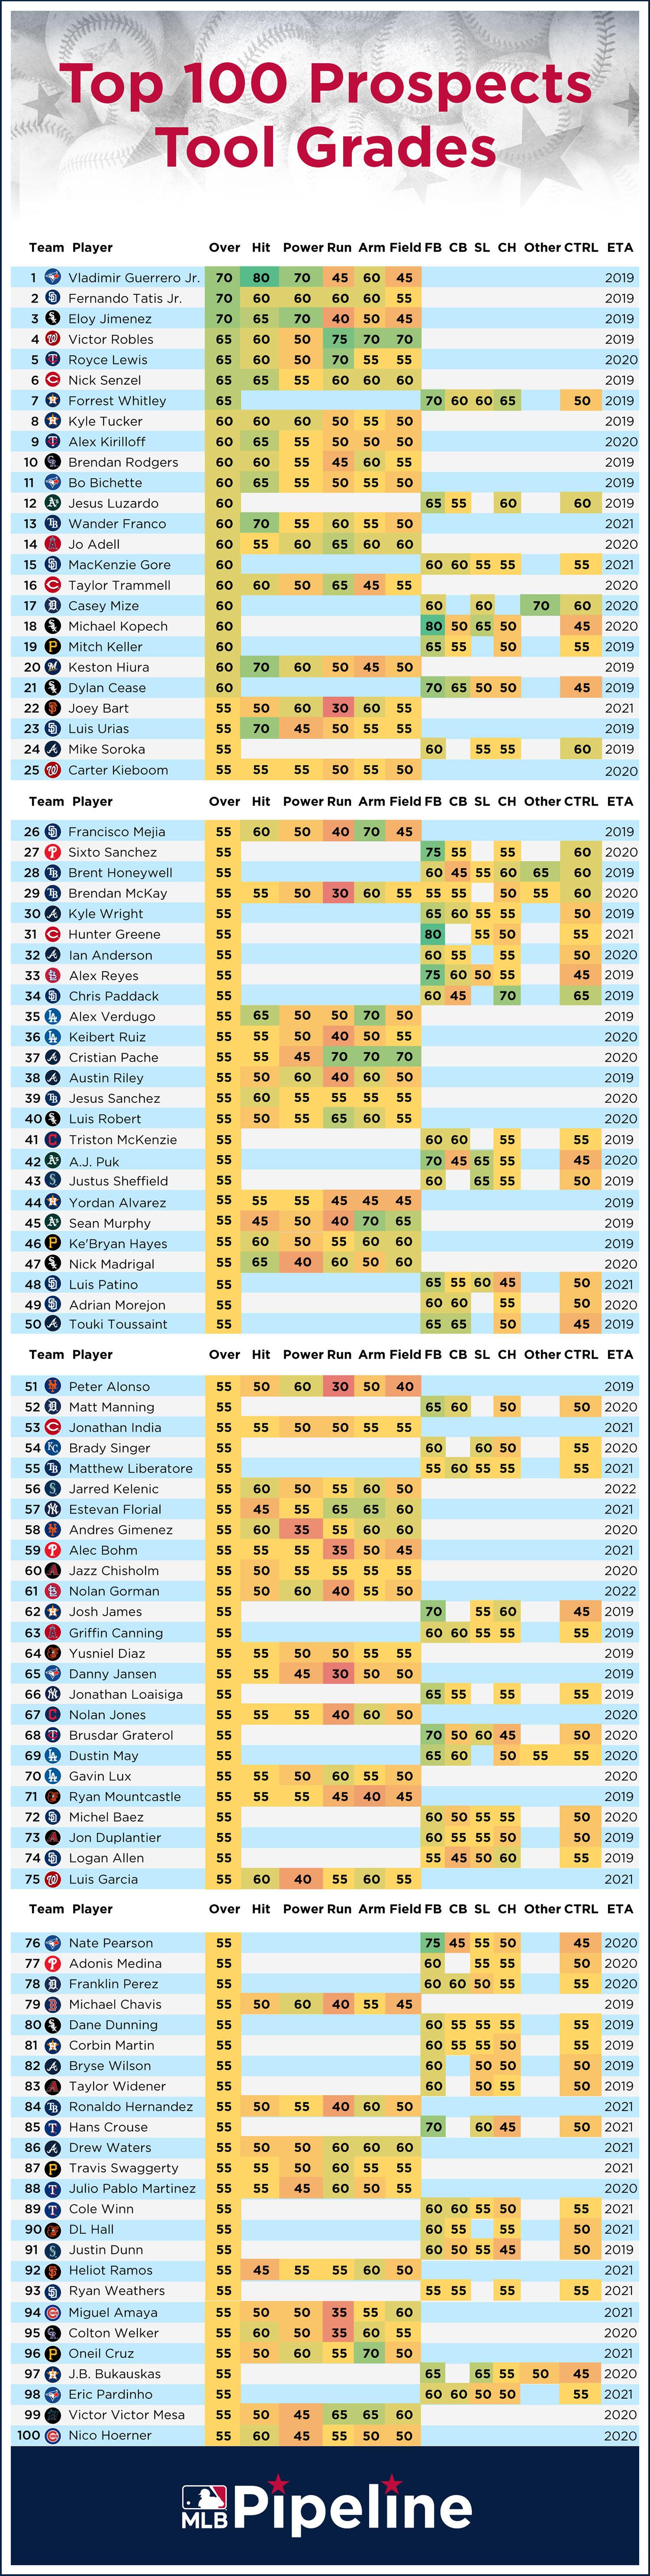 Baseball America Top 100 Prospects 2020.Best Tools On 2019 Top 100 Prospects List Mlb Com